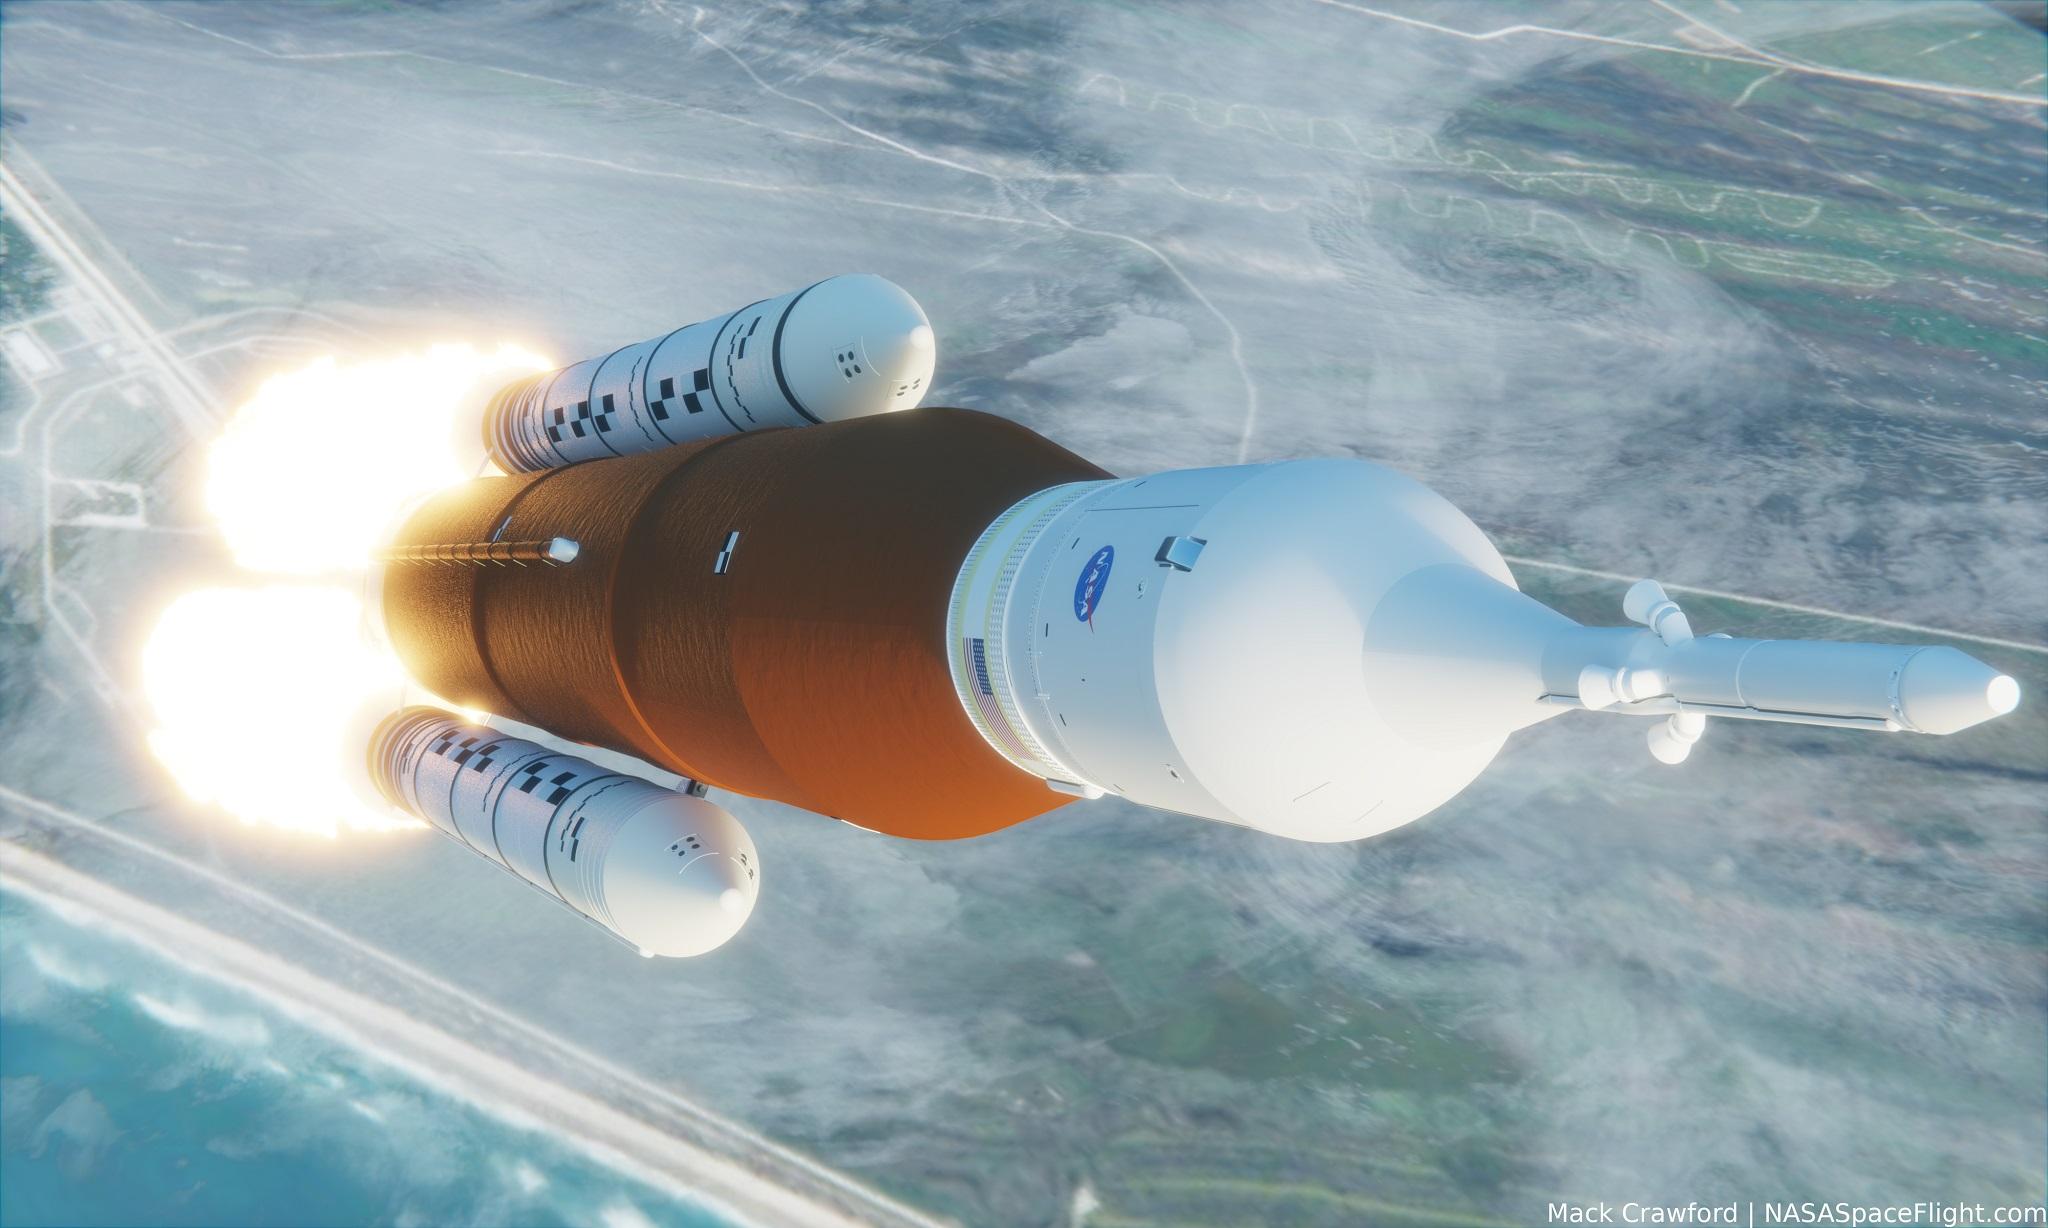 NASA SLS computer development branching to support first flight, future upgrades - NASASpaceFlight.com - NASASpaceflight.com